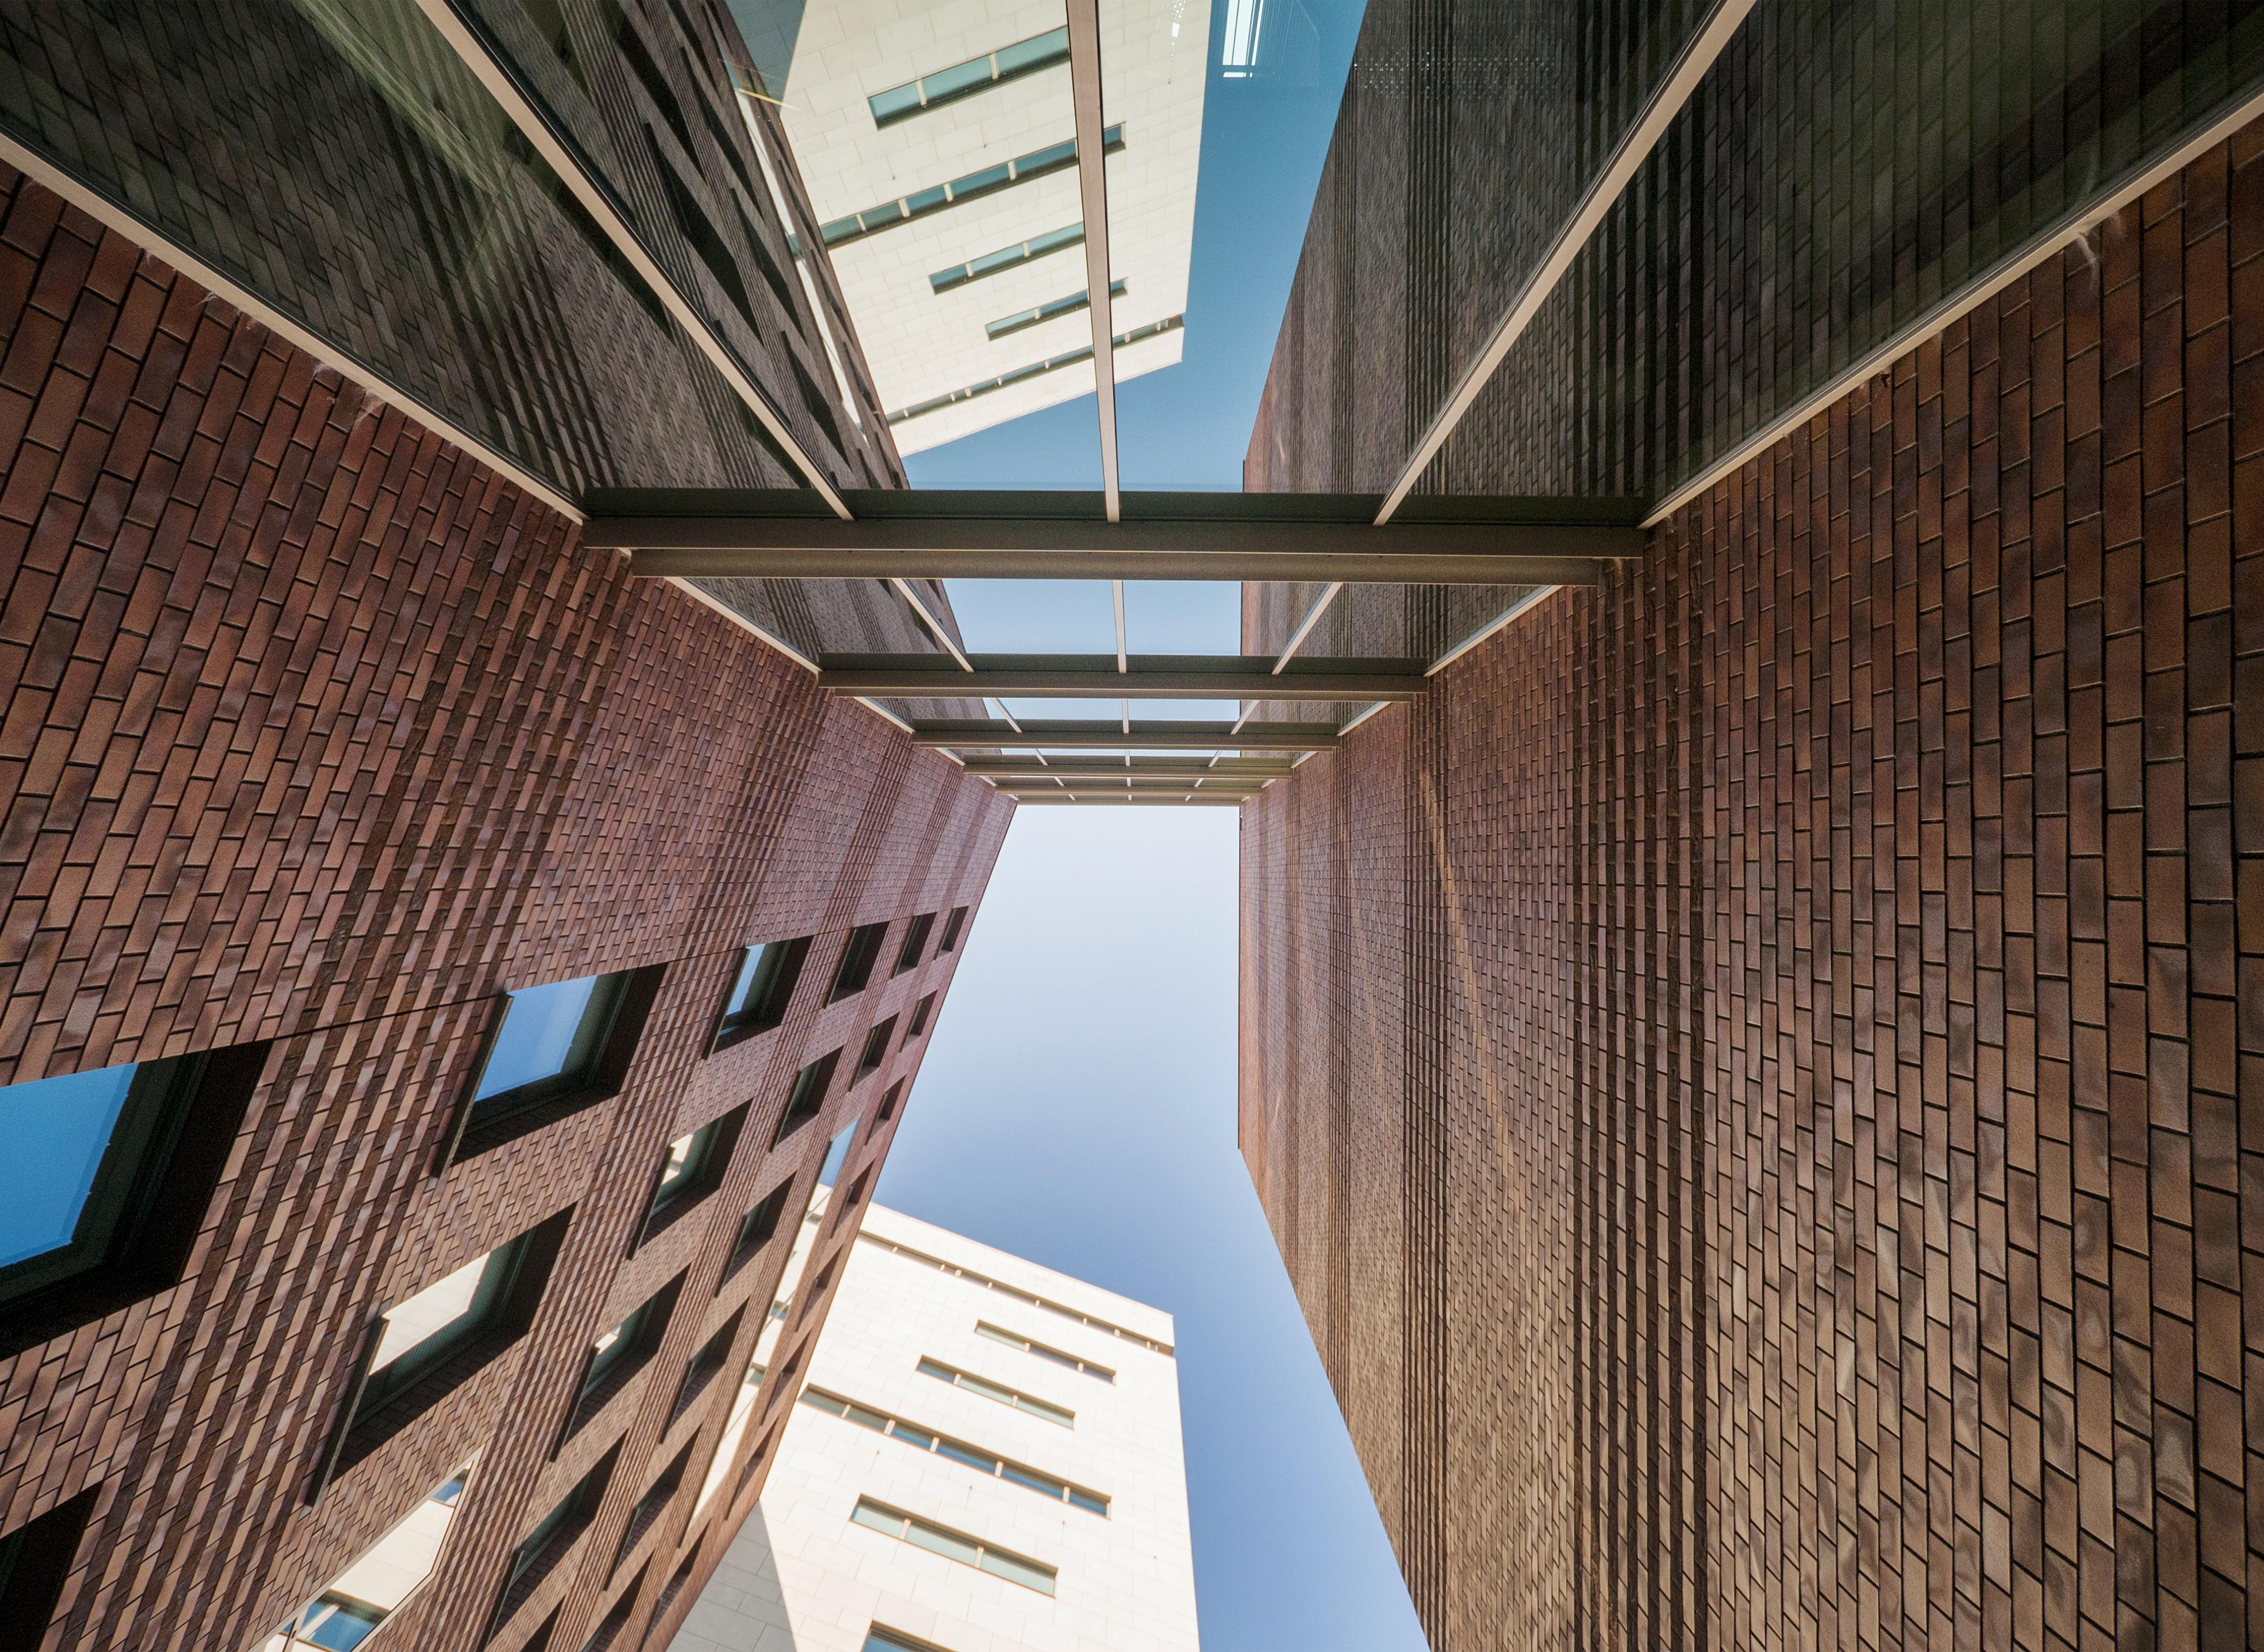 David Pronk, Looking up, Amersfoort